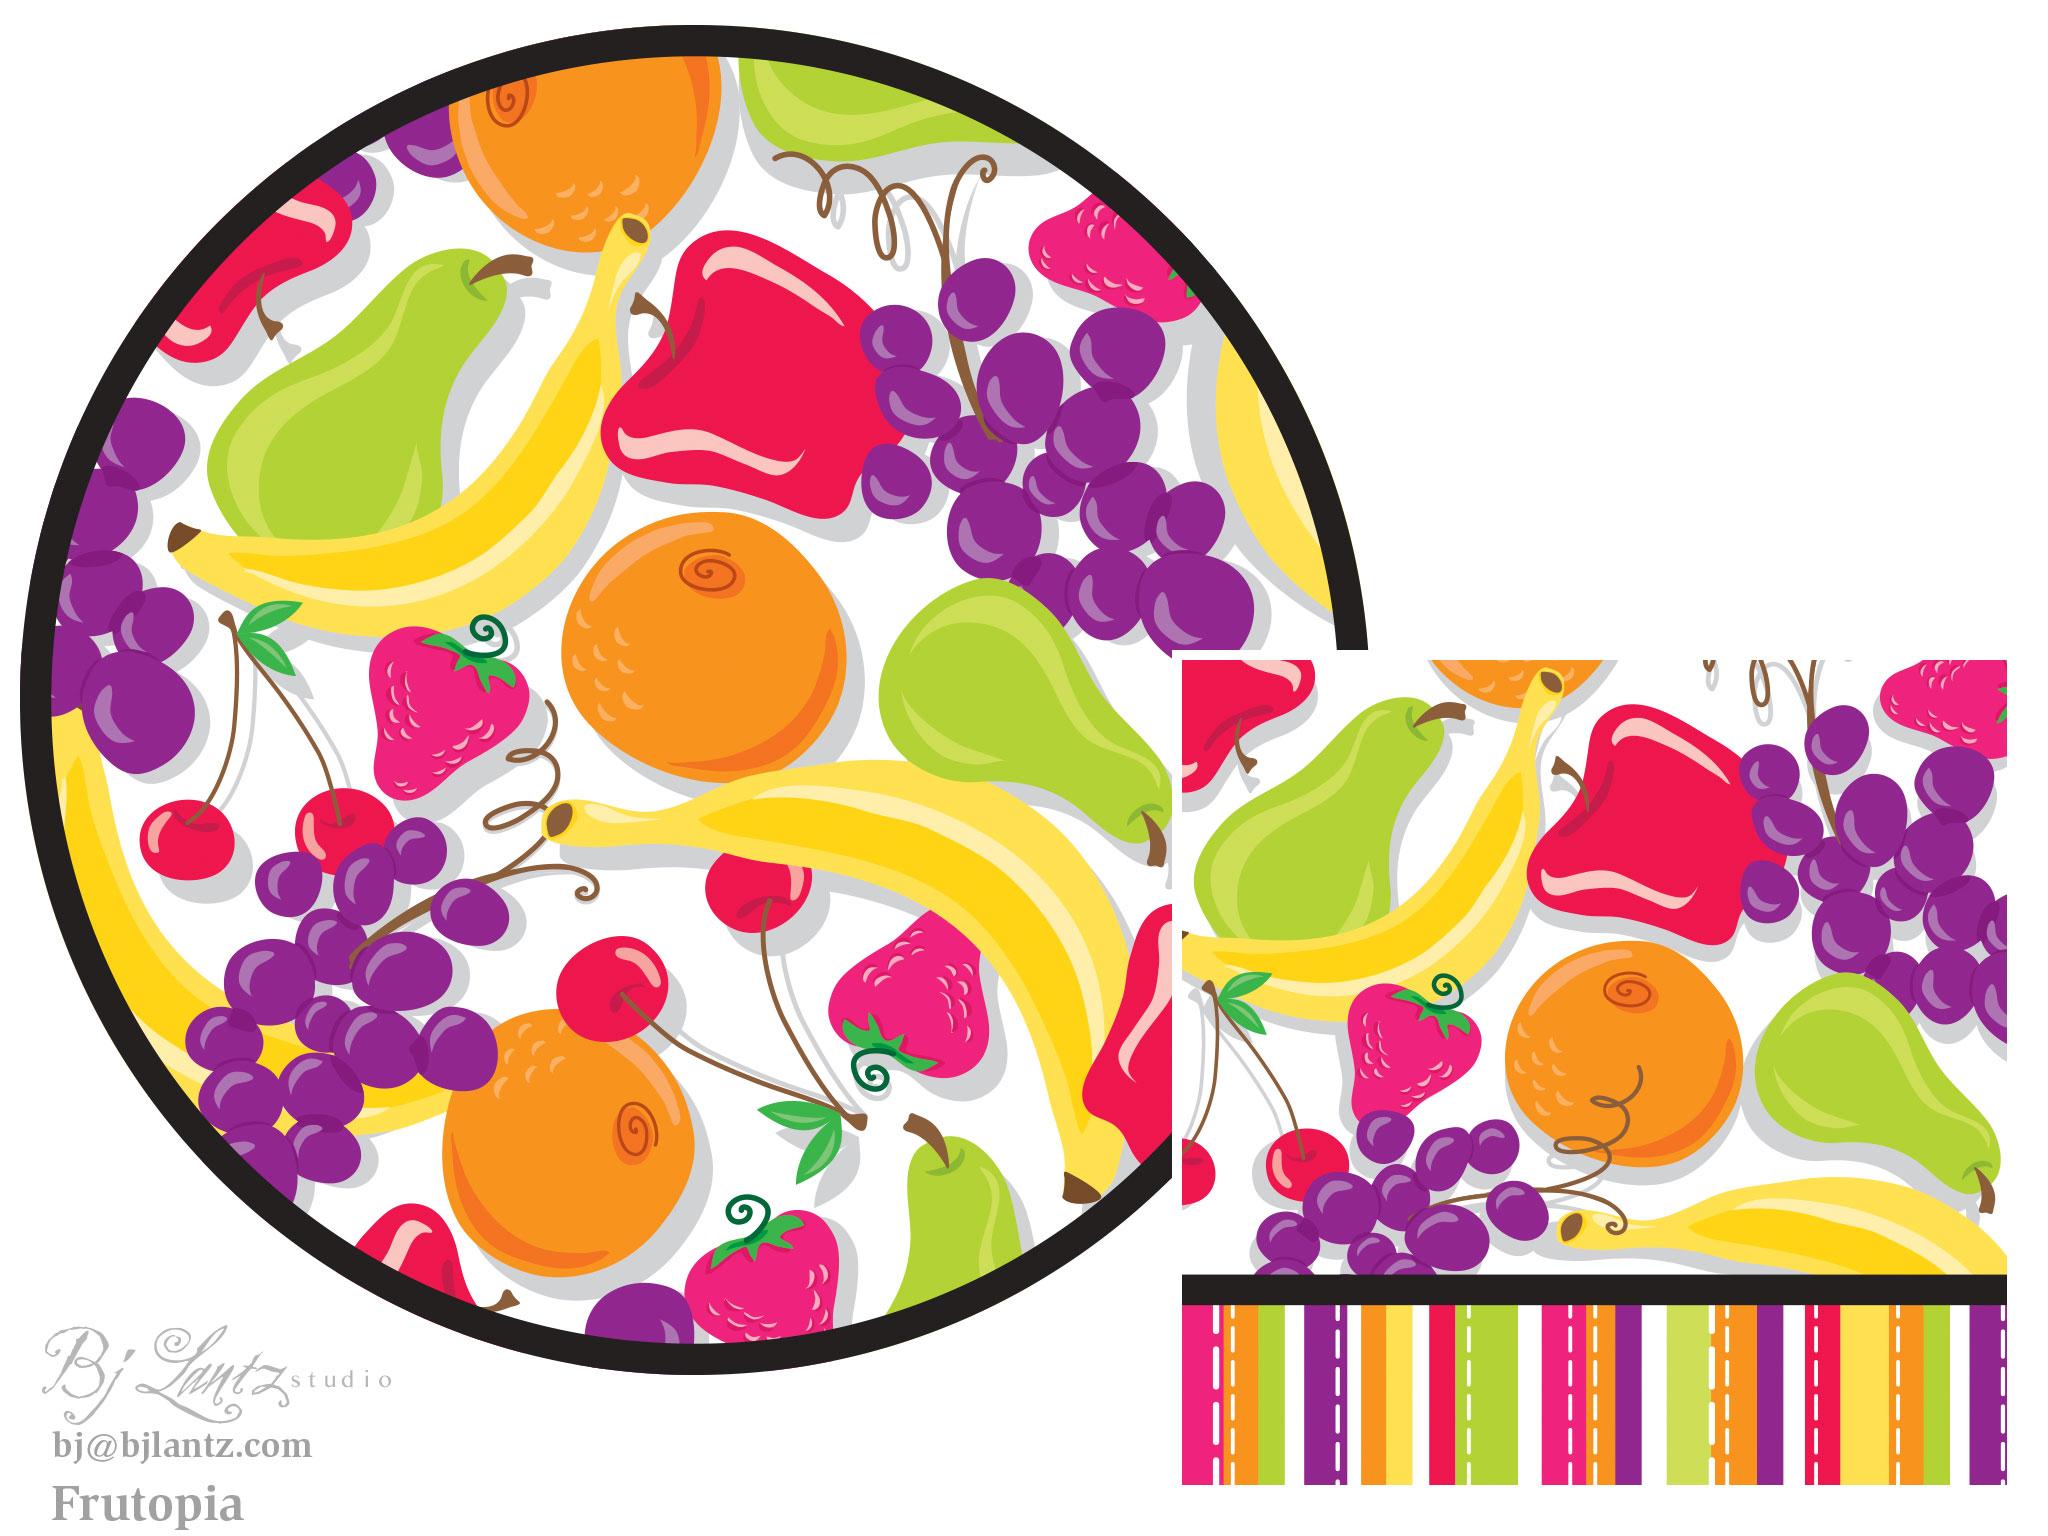 Fruitopia_BJLantz_1.jpg